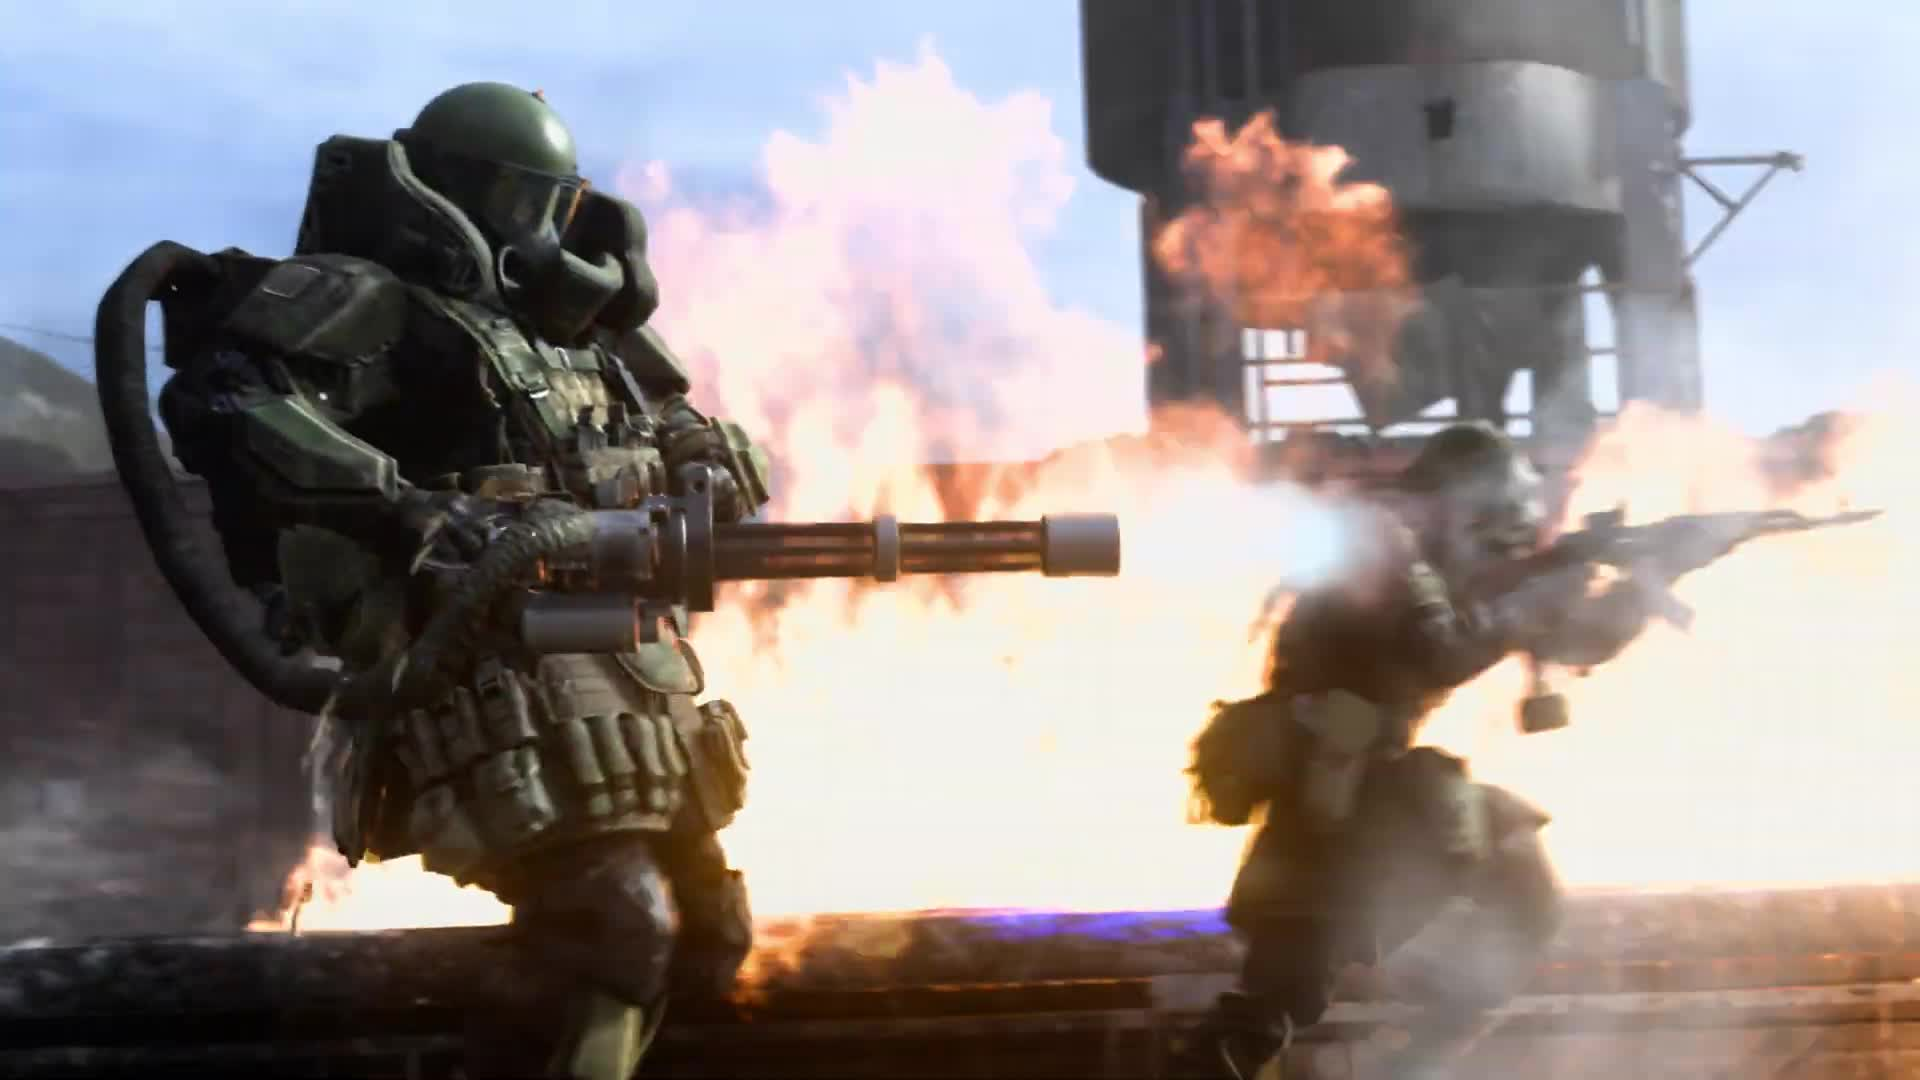 Trailer, Ego-Shooter, Multiplayer, Call of Duty, Activision, Infinity Ward, Modern Warfare, Call of Duty: Modern Warfare